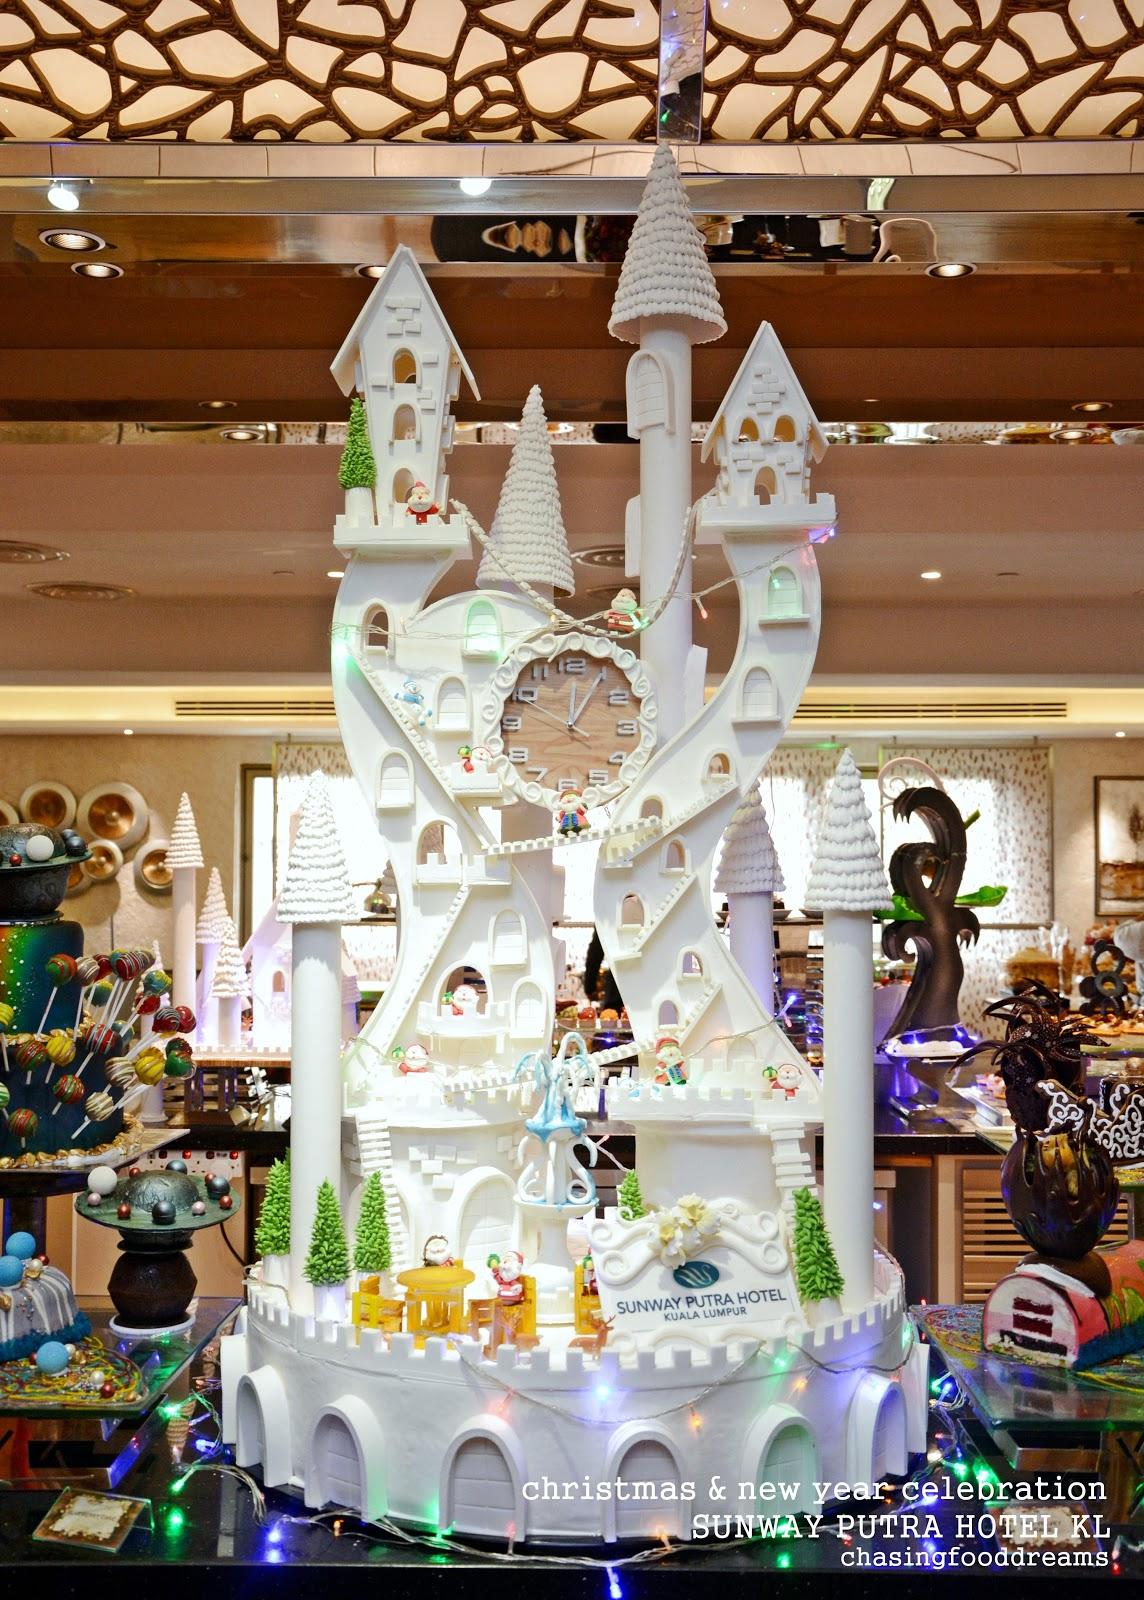 CHASING FOOD DREAMS: Christmas Buffet @ Sunway Putra Hotel